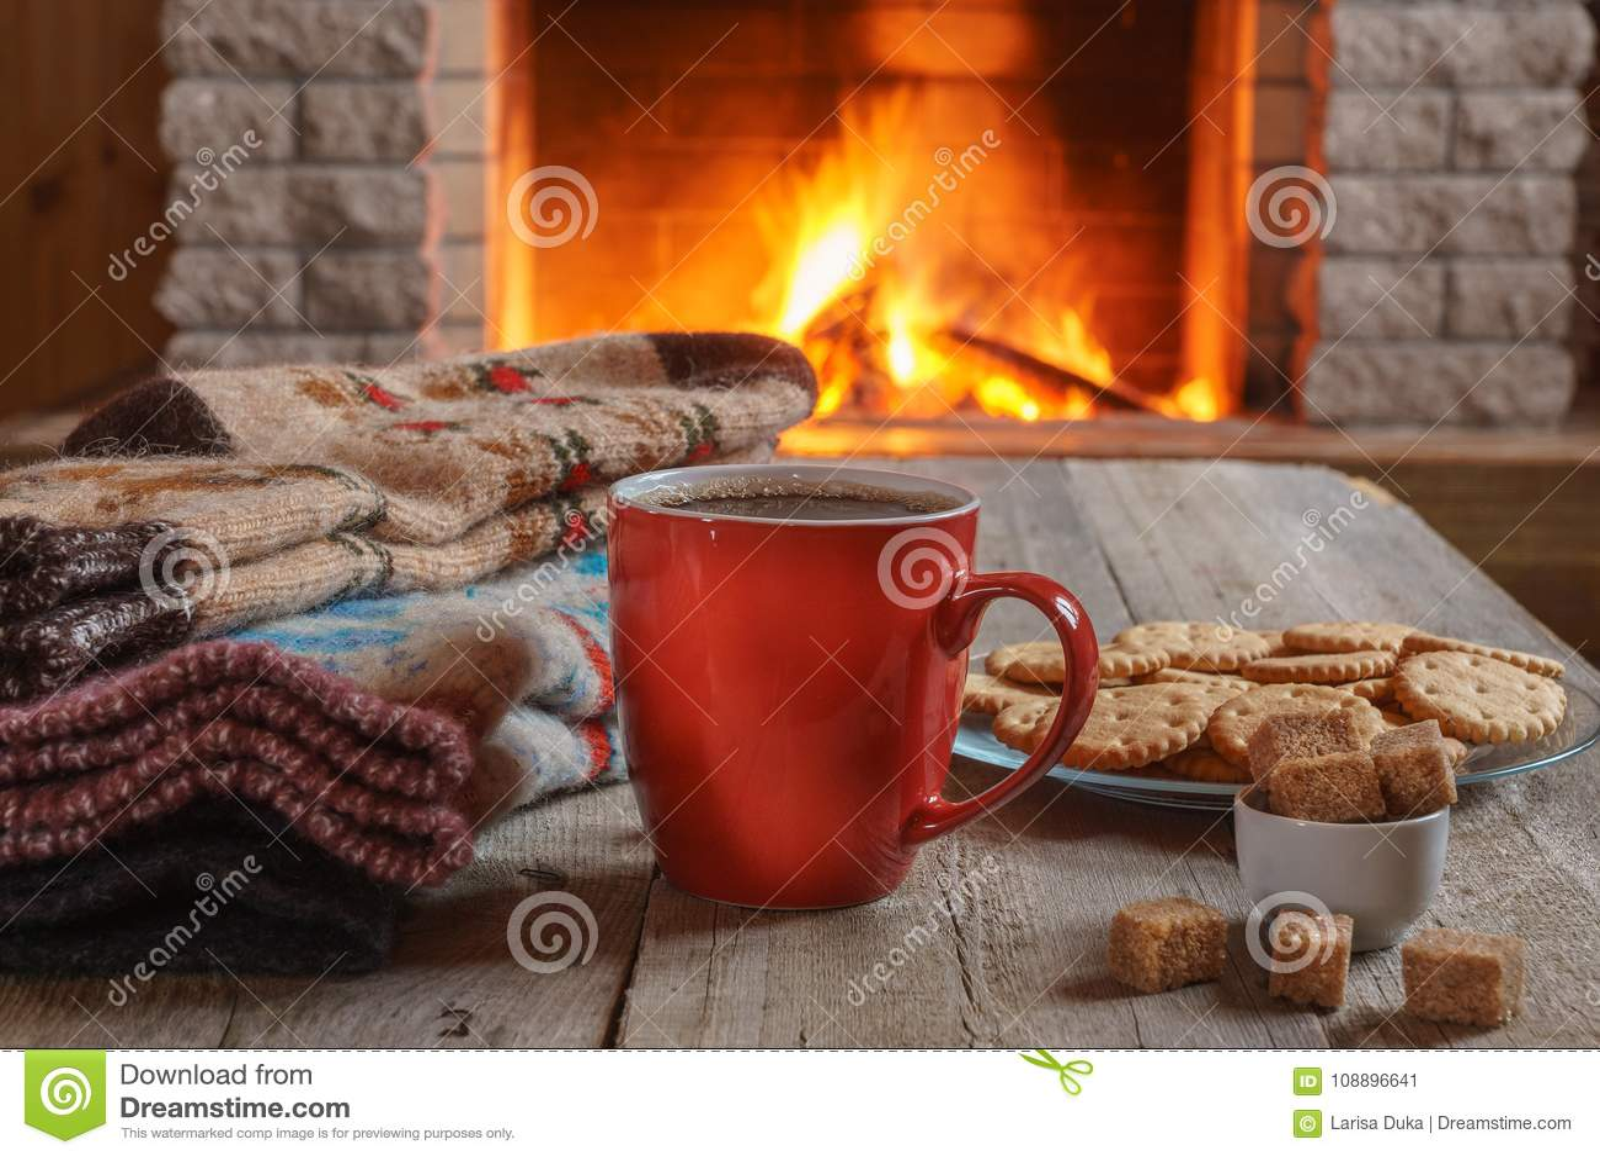 Orange mug for tea or coffee; wool things near cozy fireplace.